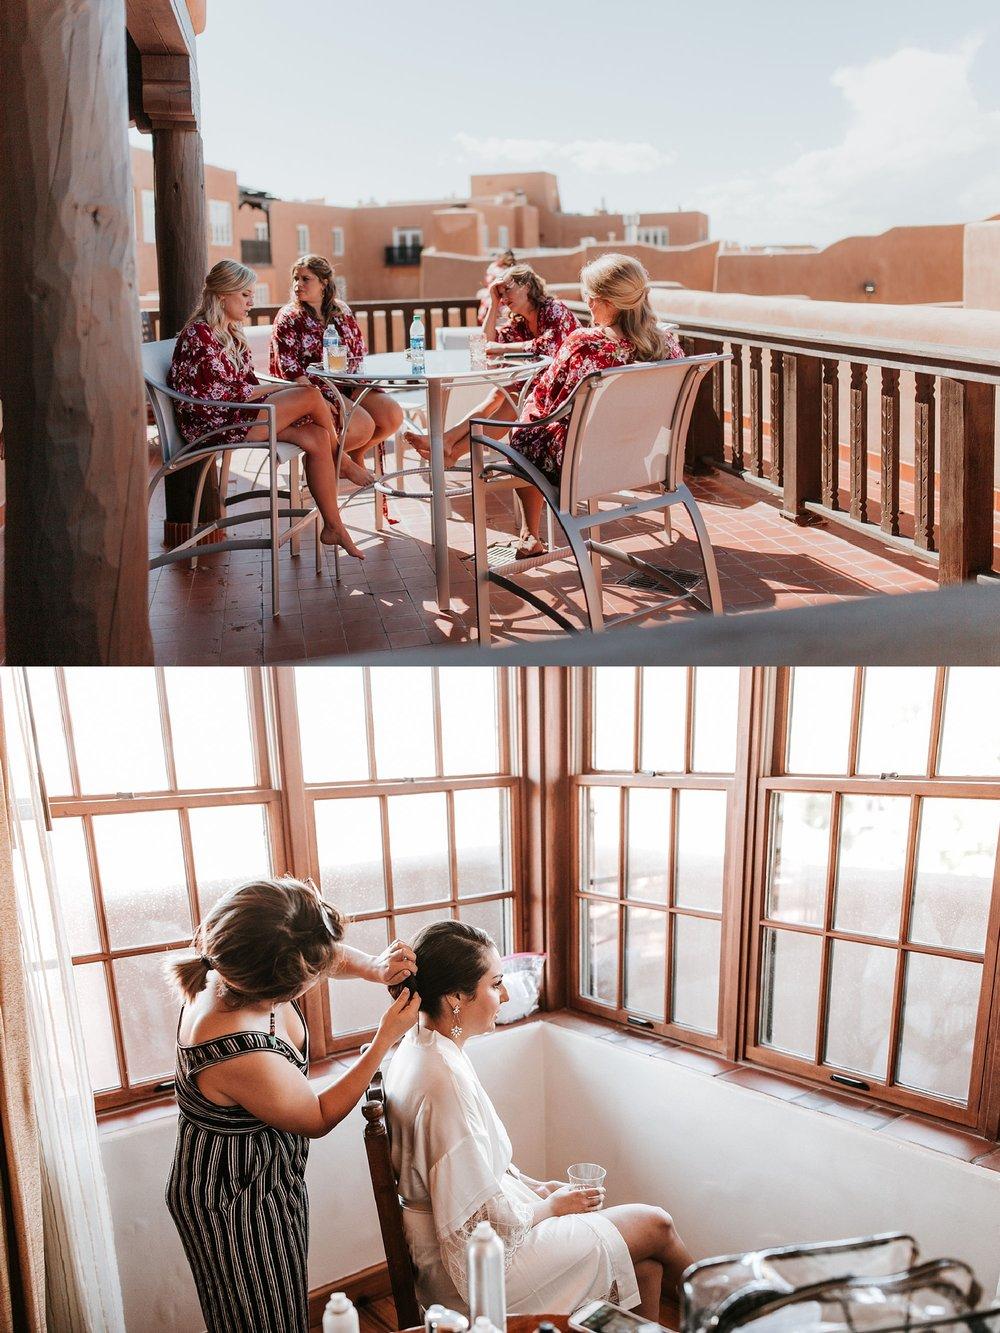 Alicia+lucia+photography+-+albuquerque+wedding+photographer+-+santa+fe+wedding+photography+-+new+mexico+wedding+photographer+-+new+mexico+wedding+-+engagement+-+santa+fe+wedding+-+la+fonda+on+the+plaza+-+la+fonda+wedding_0004.jpg